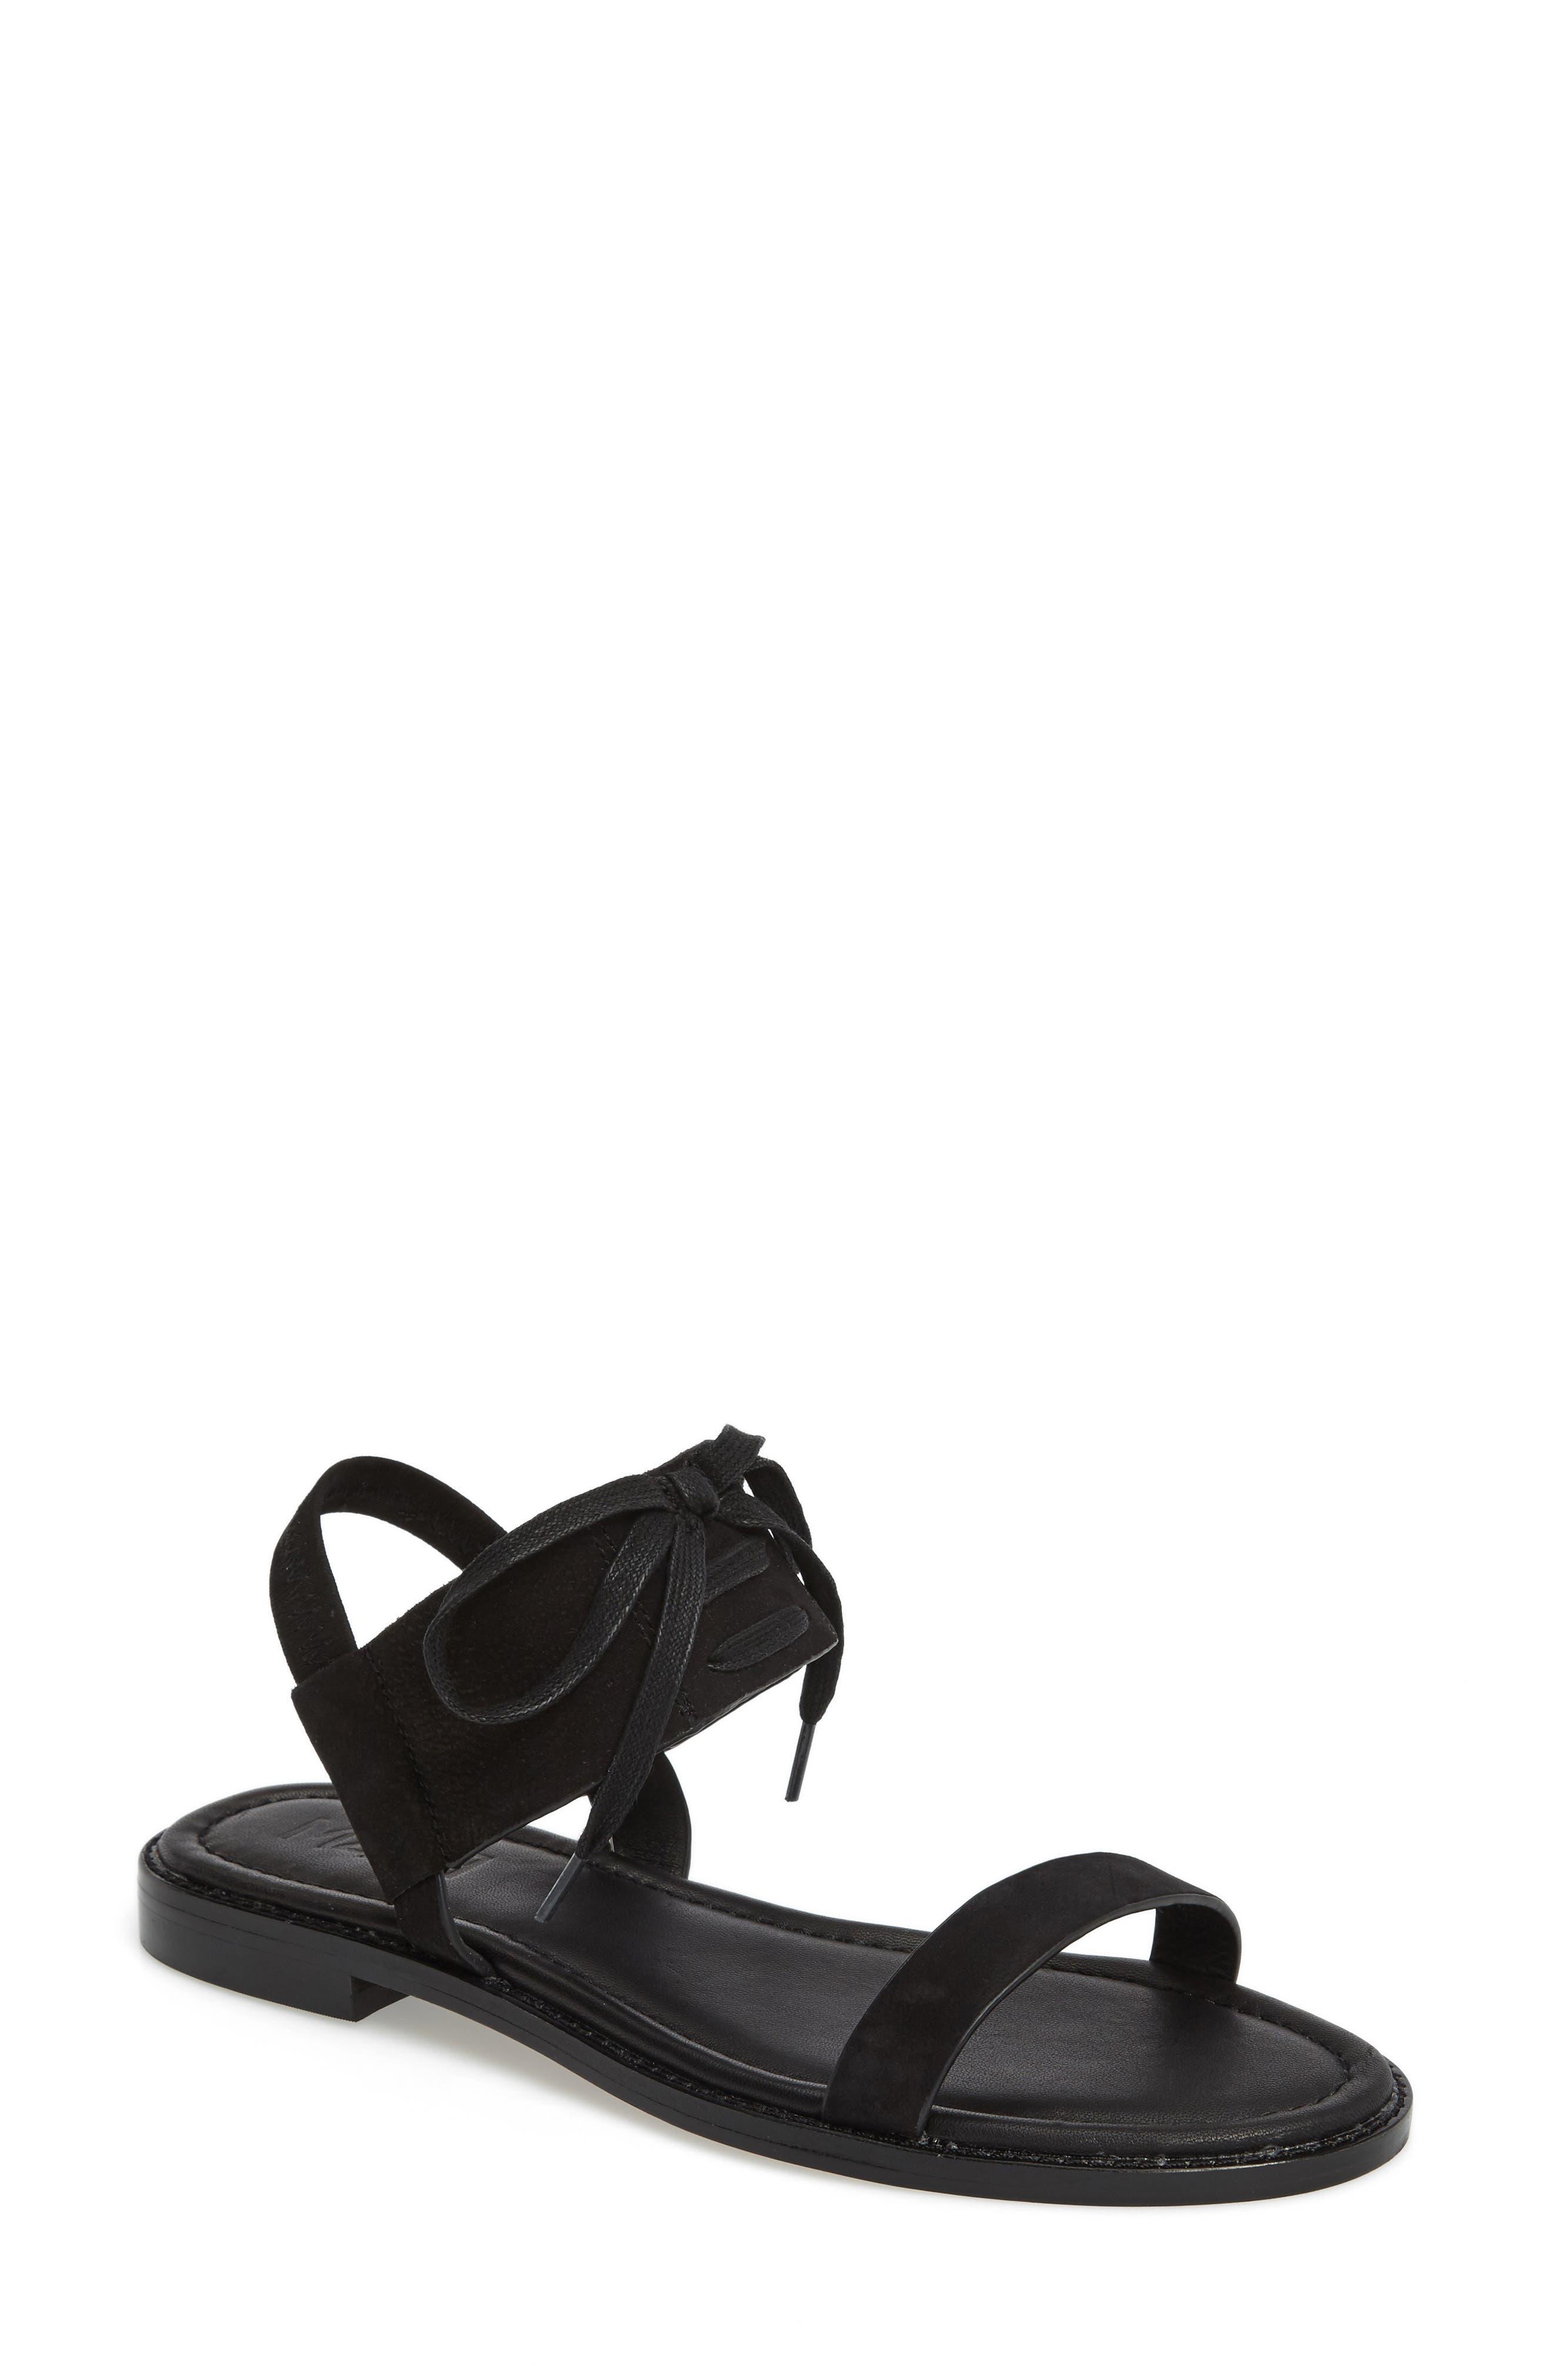 M4D3 Hailey Slingback Sandal,                         Main,                         color, 001